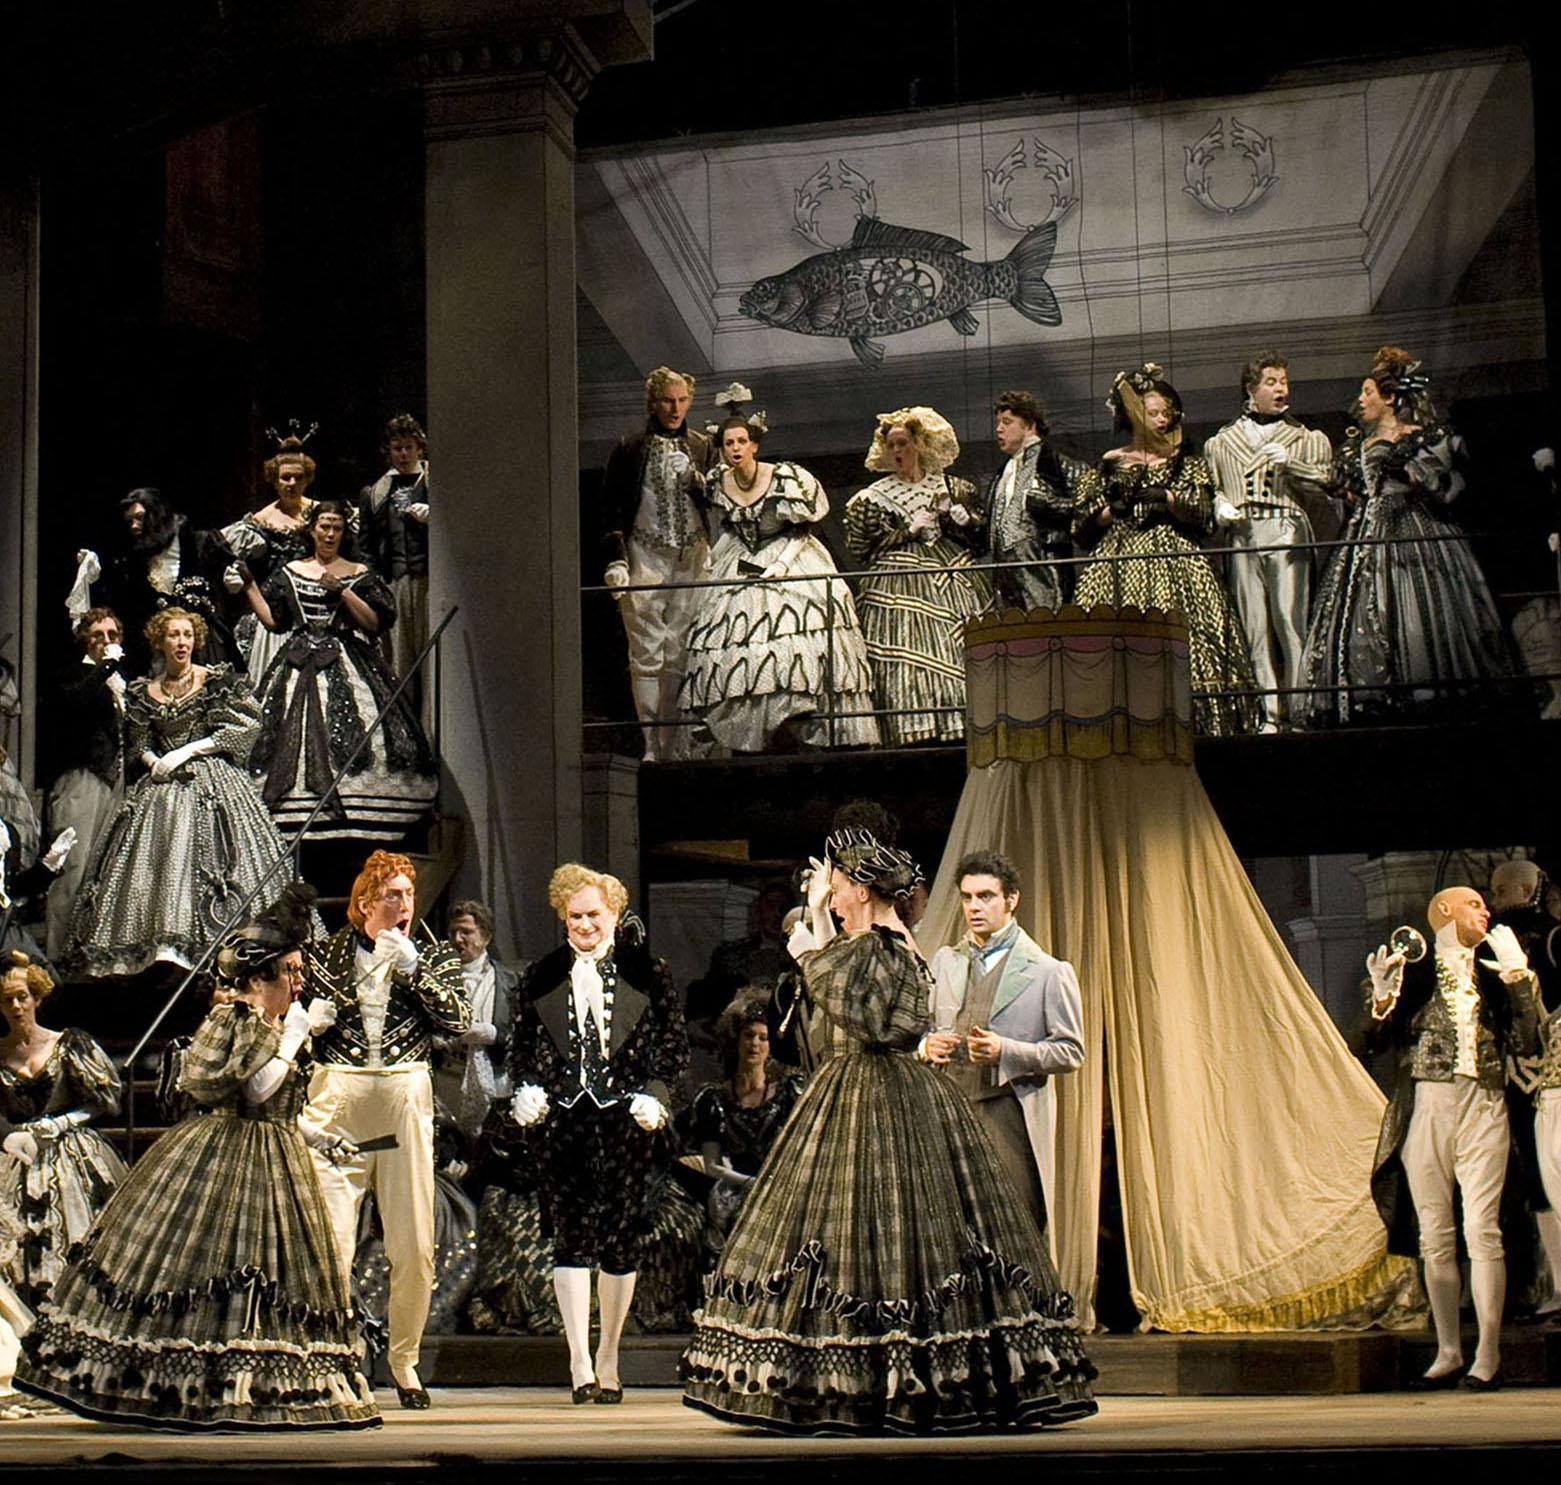 Télécharger Les Contes d'Hoffmann (Royal Opera House) Complet DVDRIP Uptobox